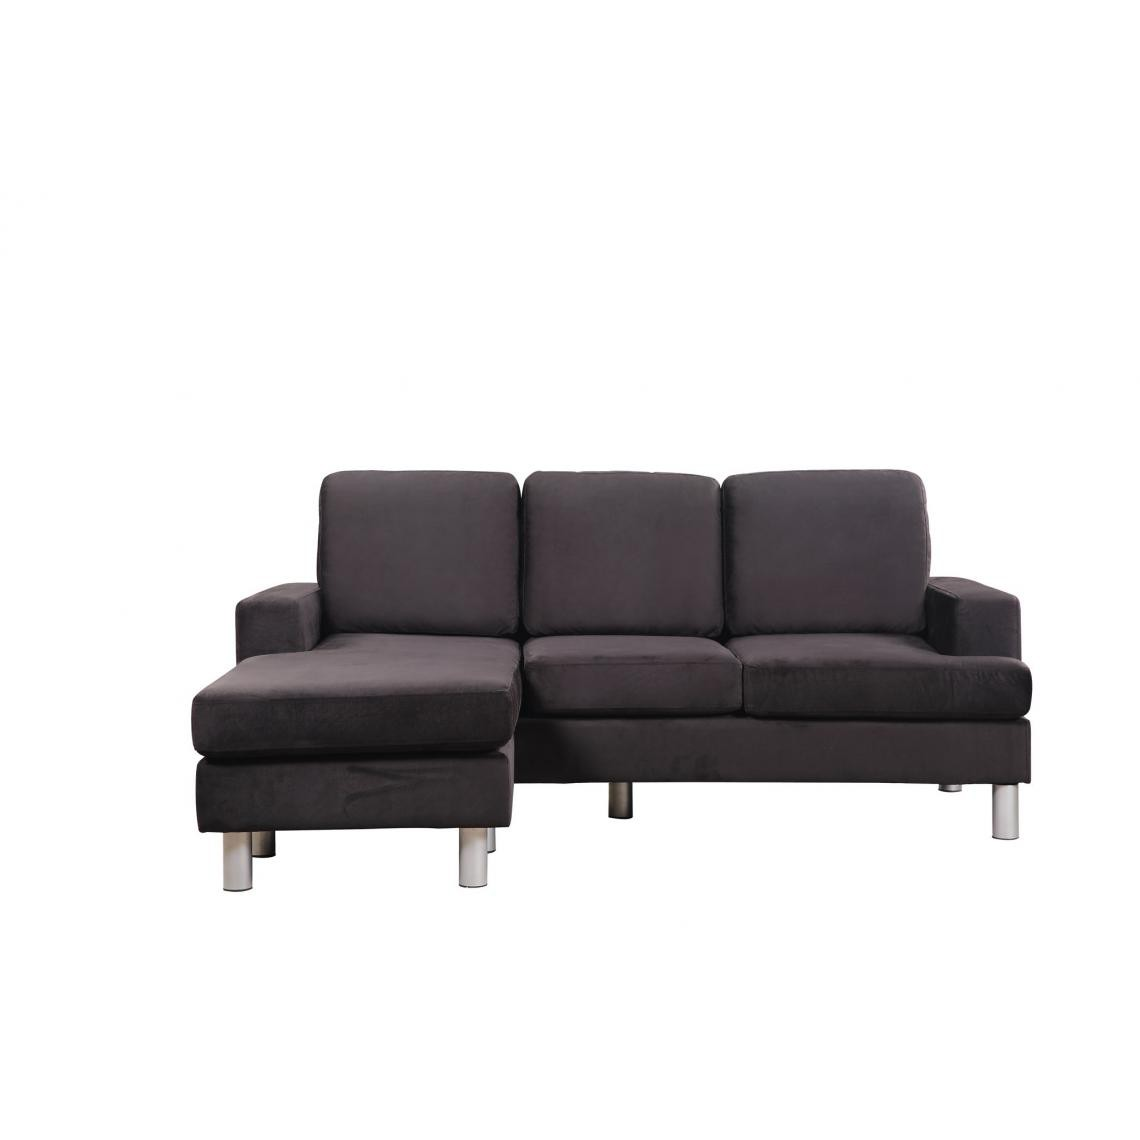 Canapé d'Angle Modulable Microfibre Noir CODEX VpUSC